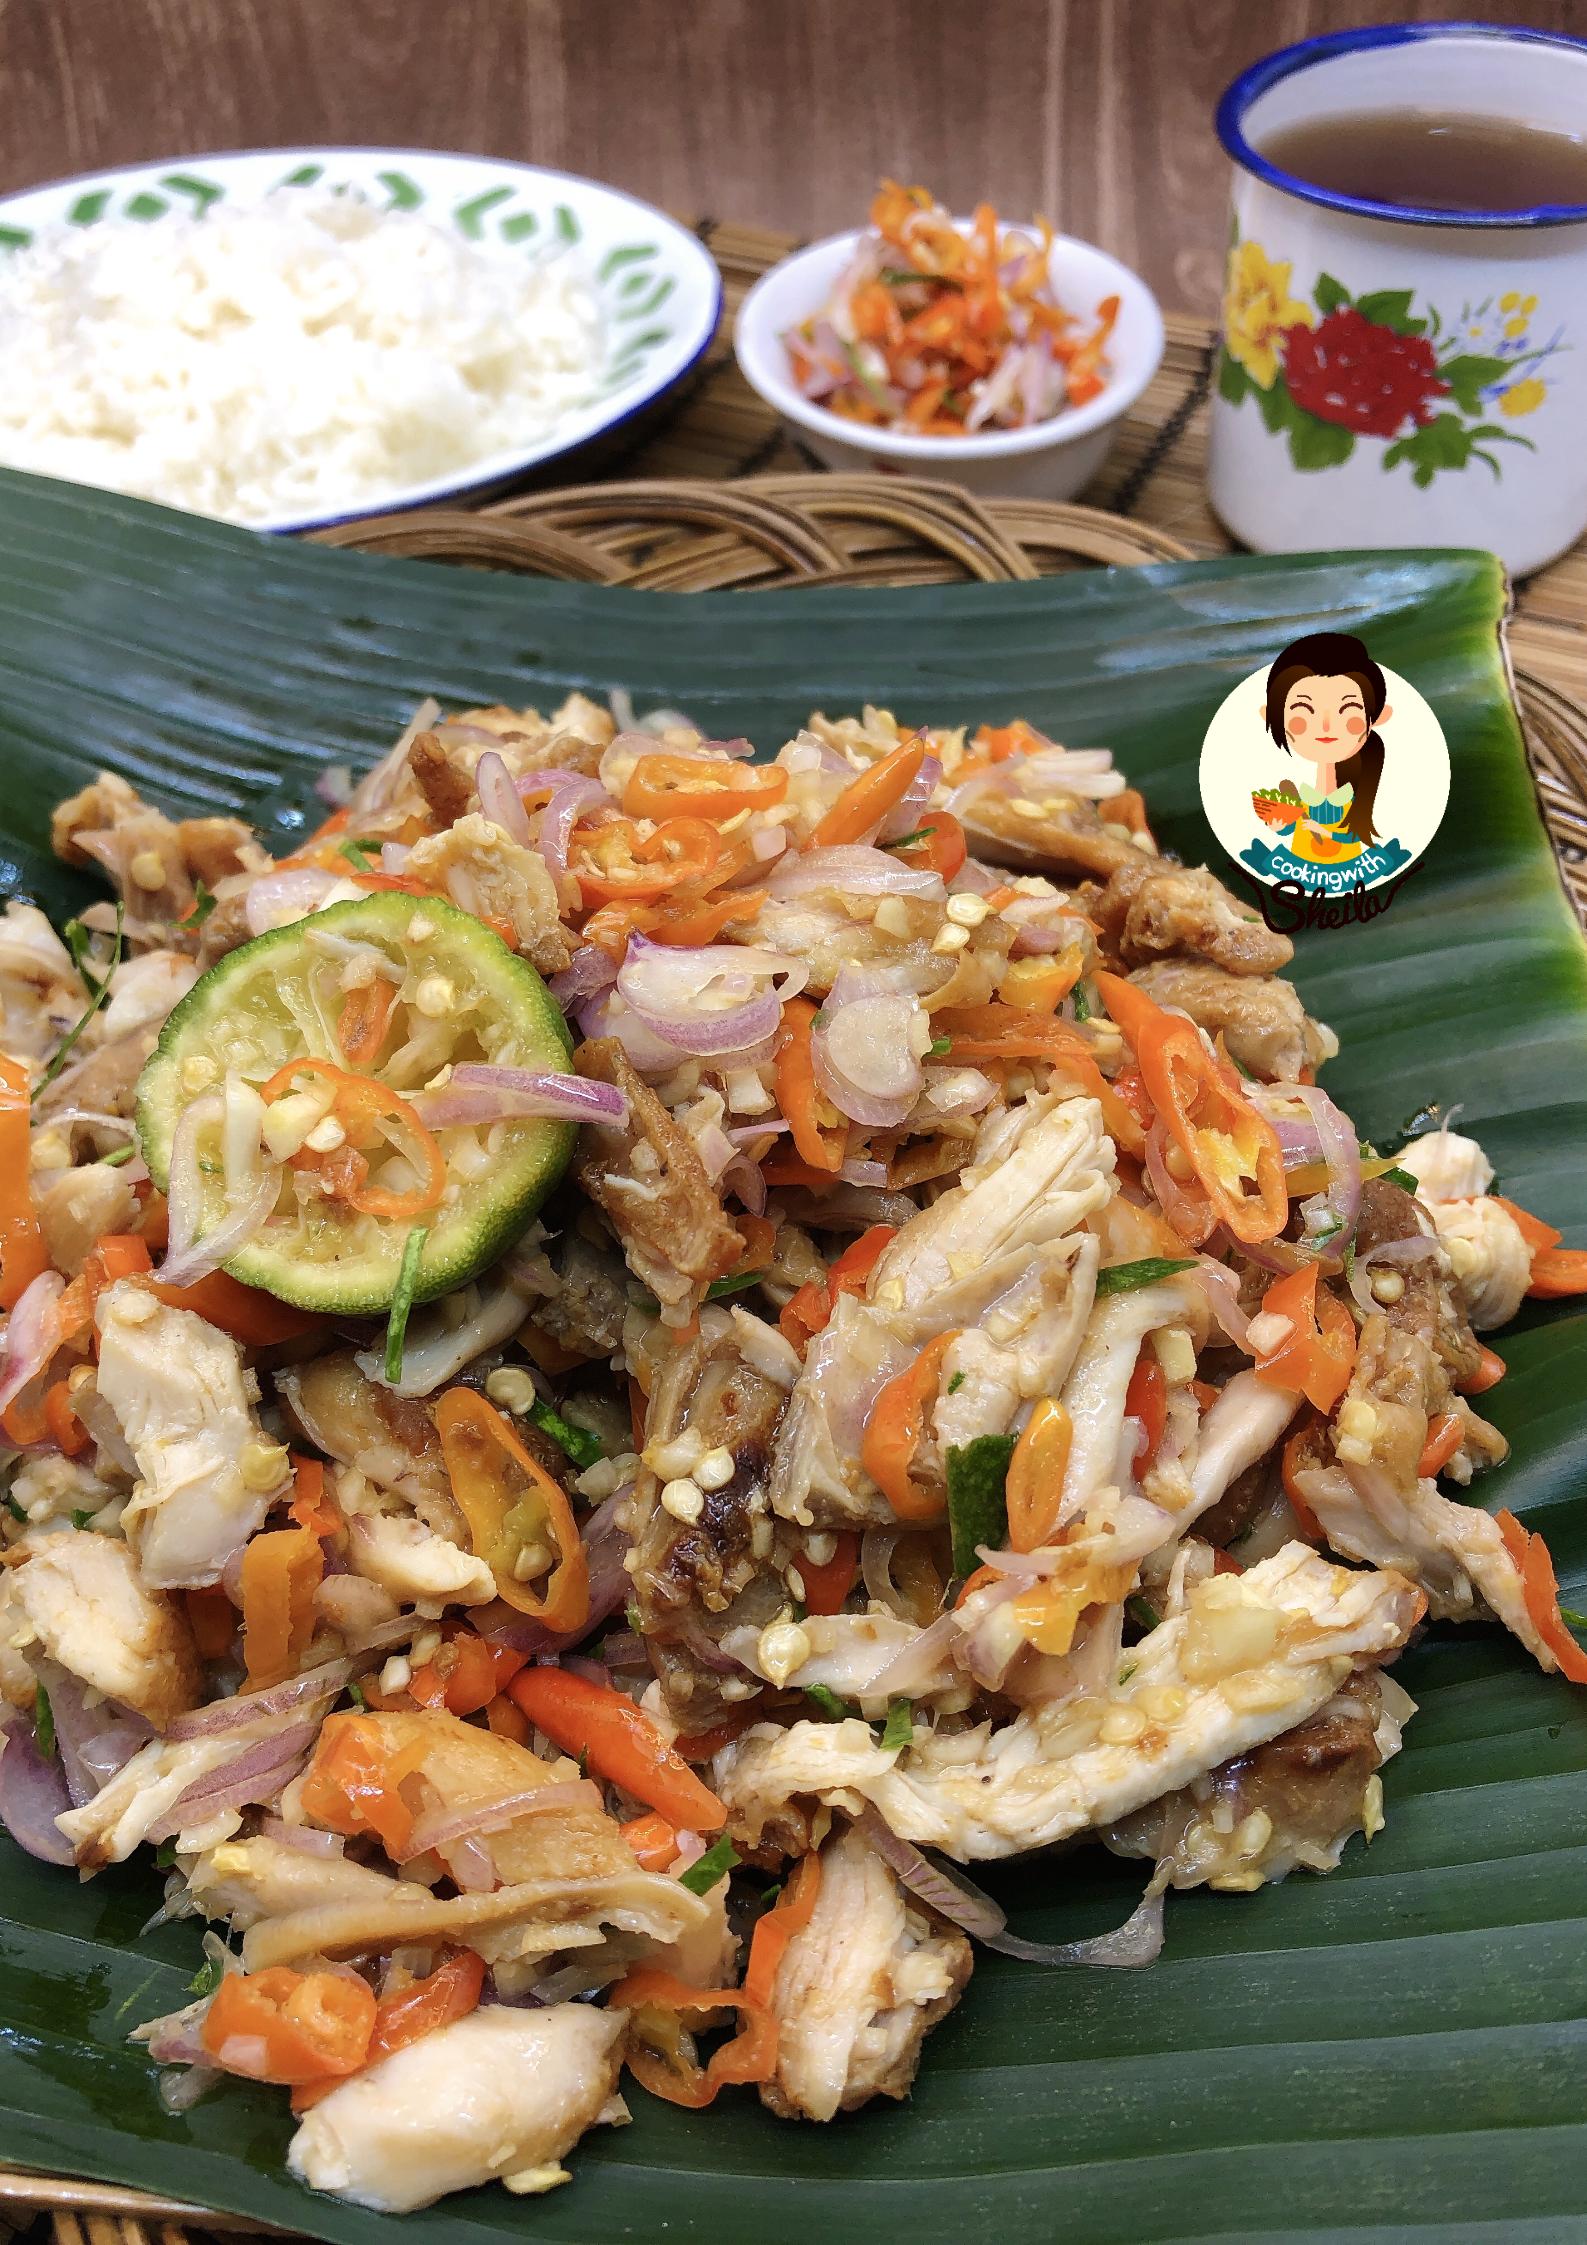 Ayam Suwir Sambal Matah Cooking With Sheila Resep Masakan Masakan Ide Makanan